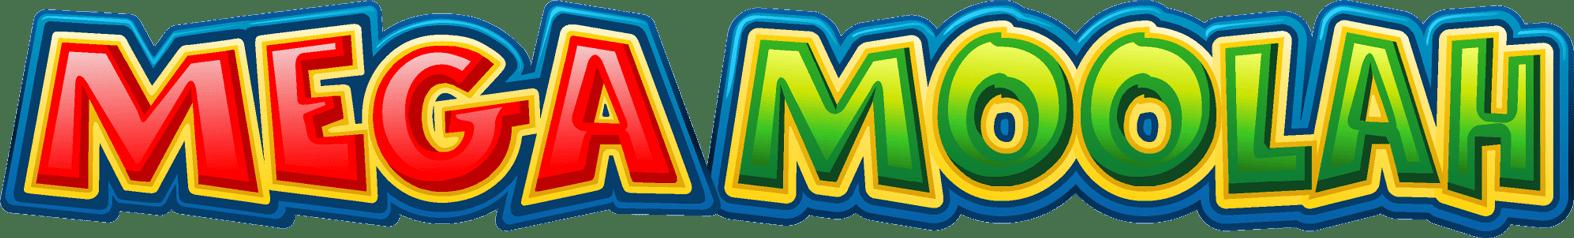 Megah-Moolah-WizardSlots